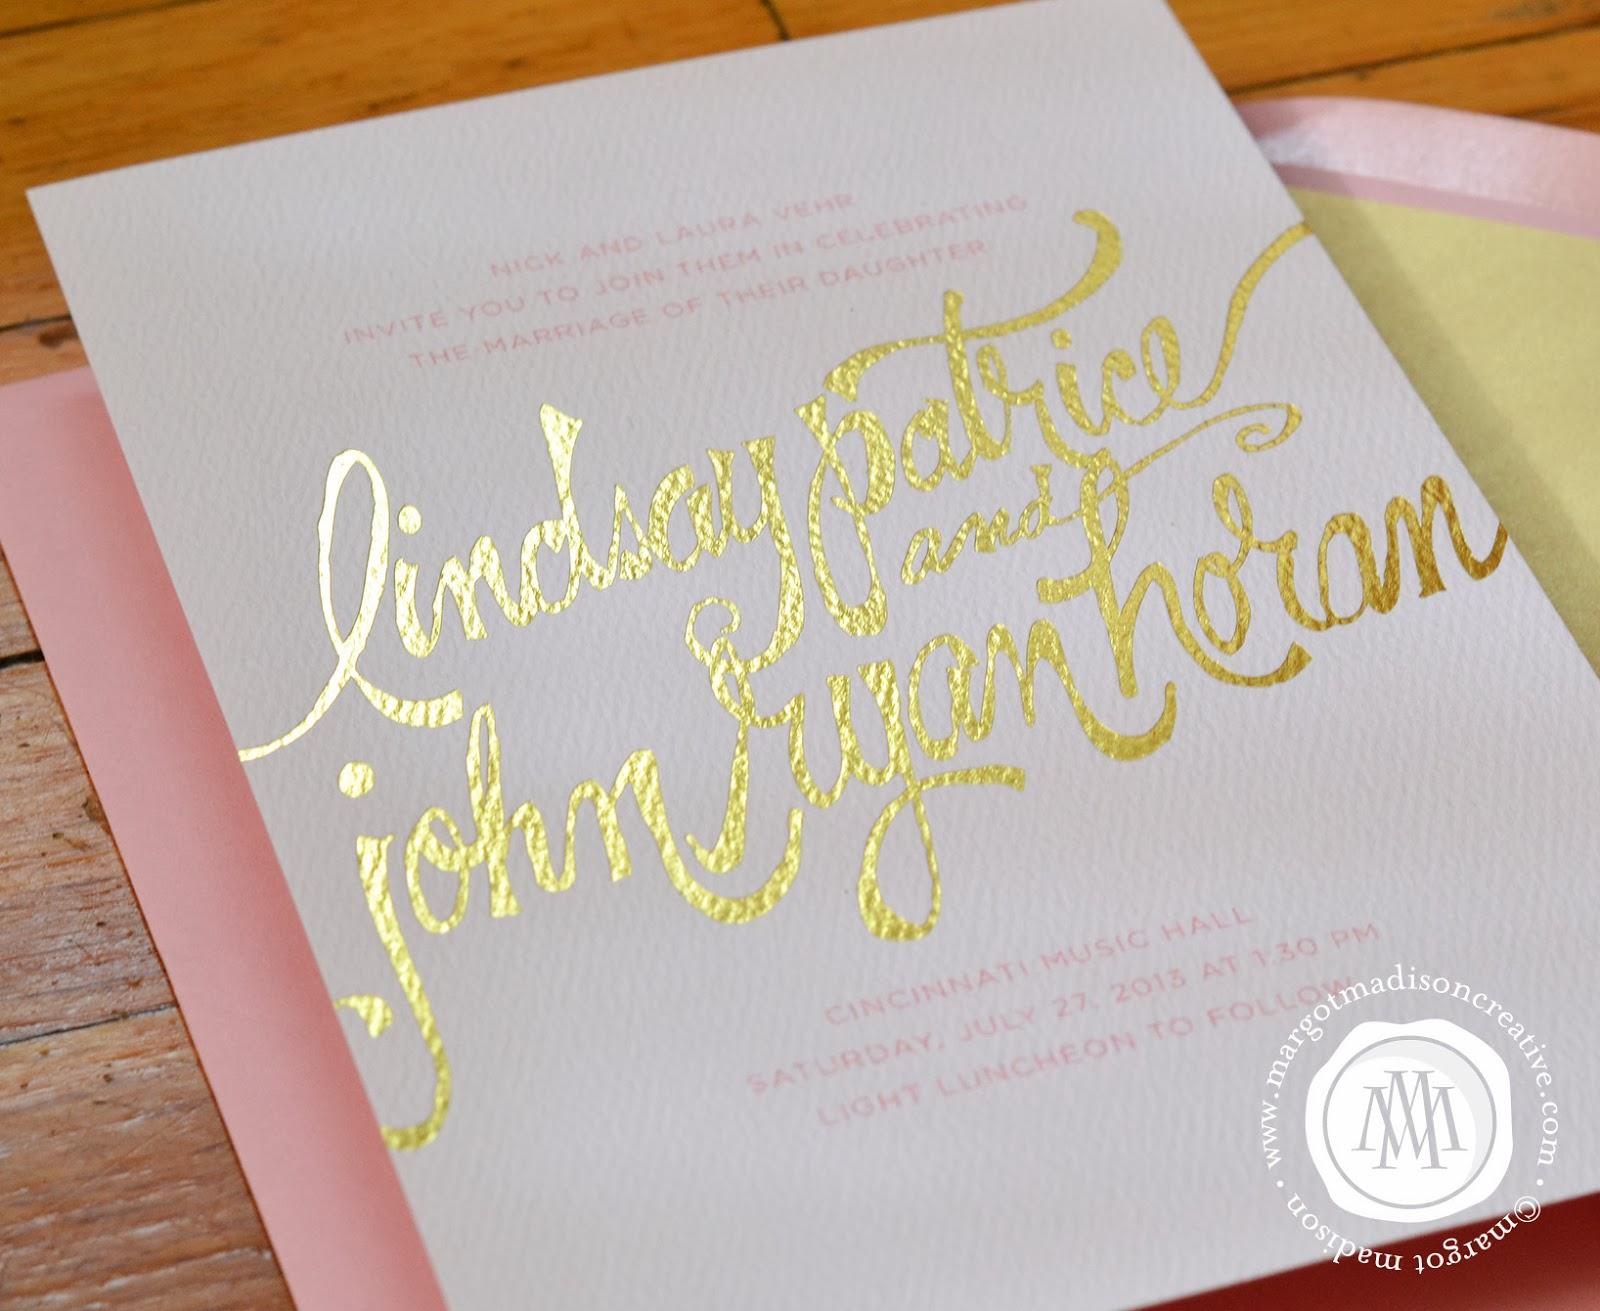 MargotMadison: Wedding Invitation Trends: Handwritten & Calligraphy